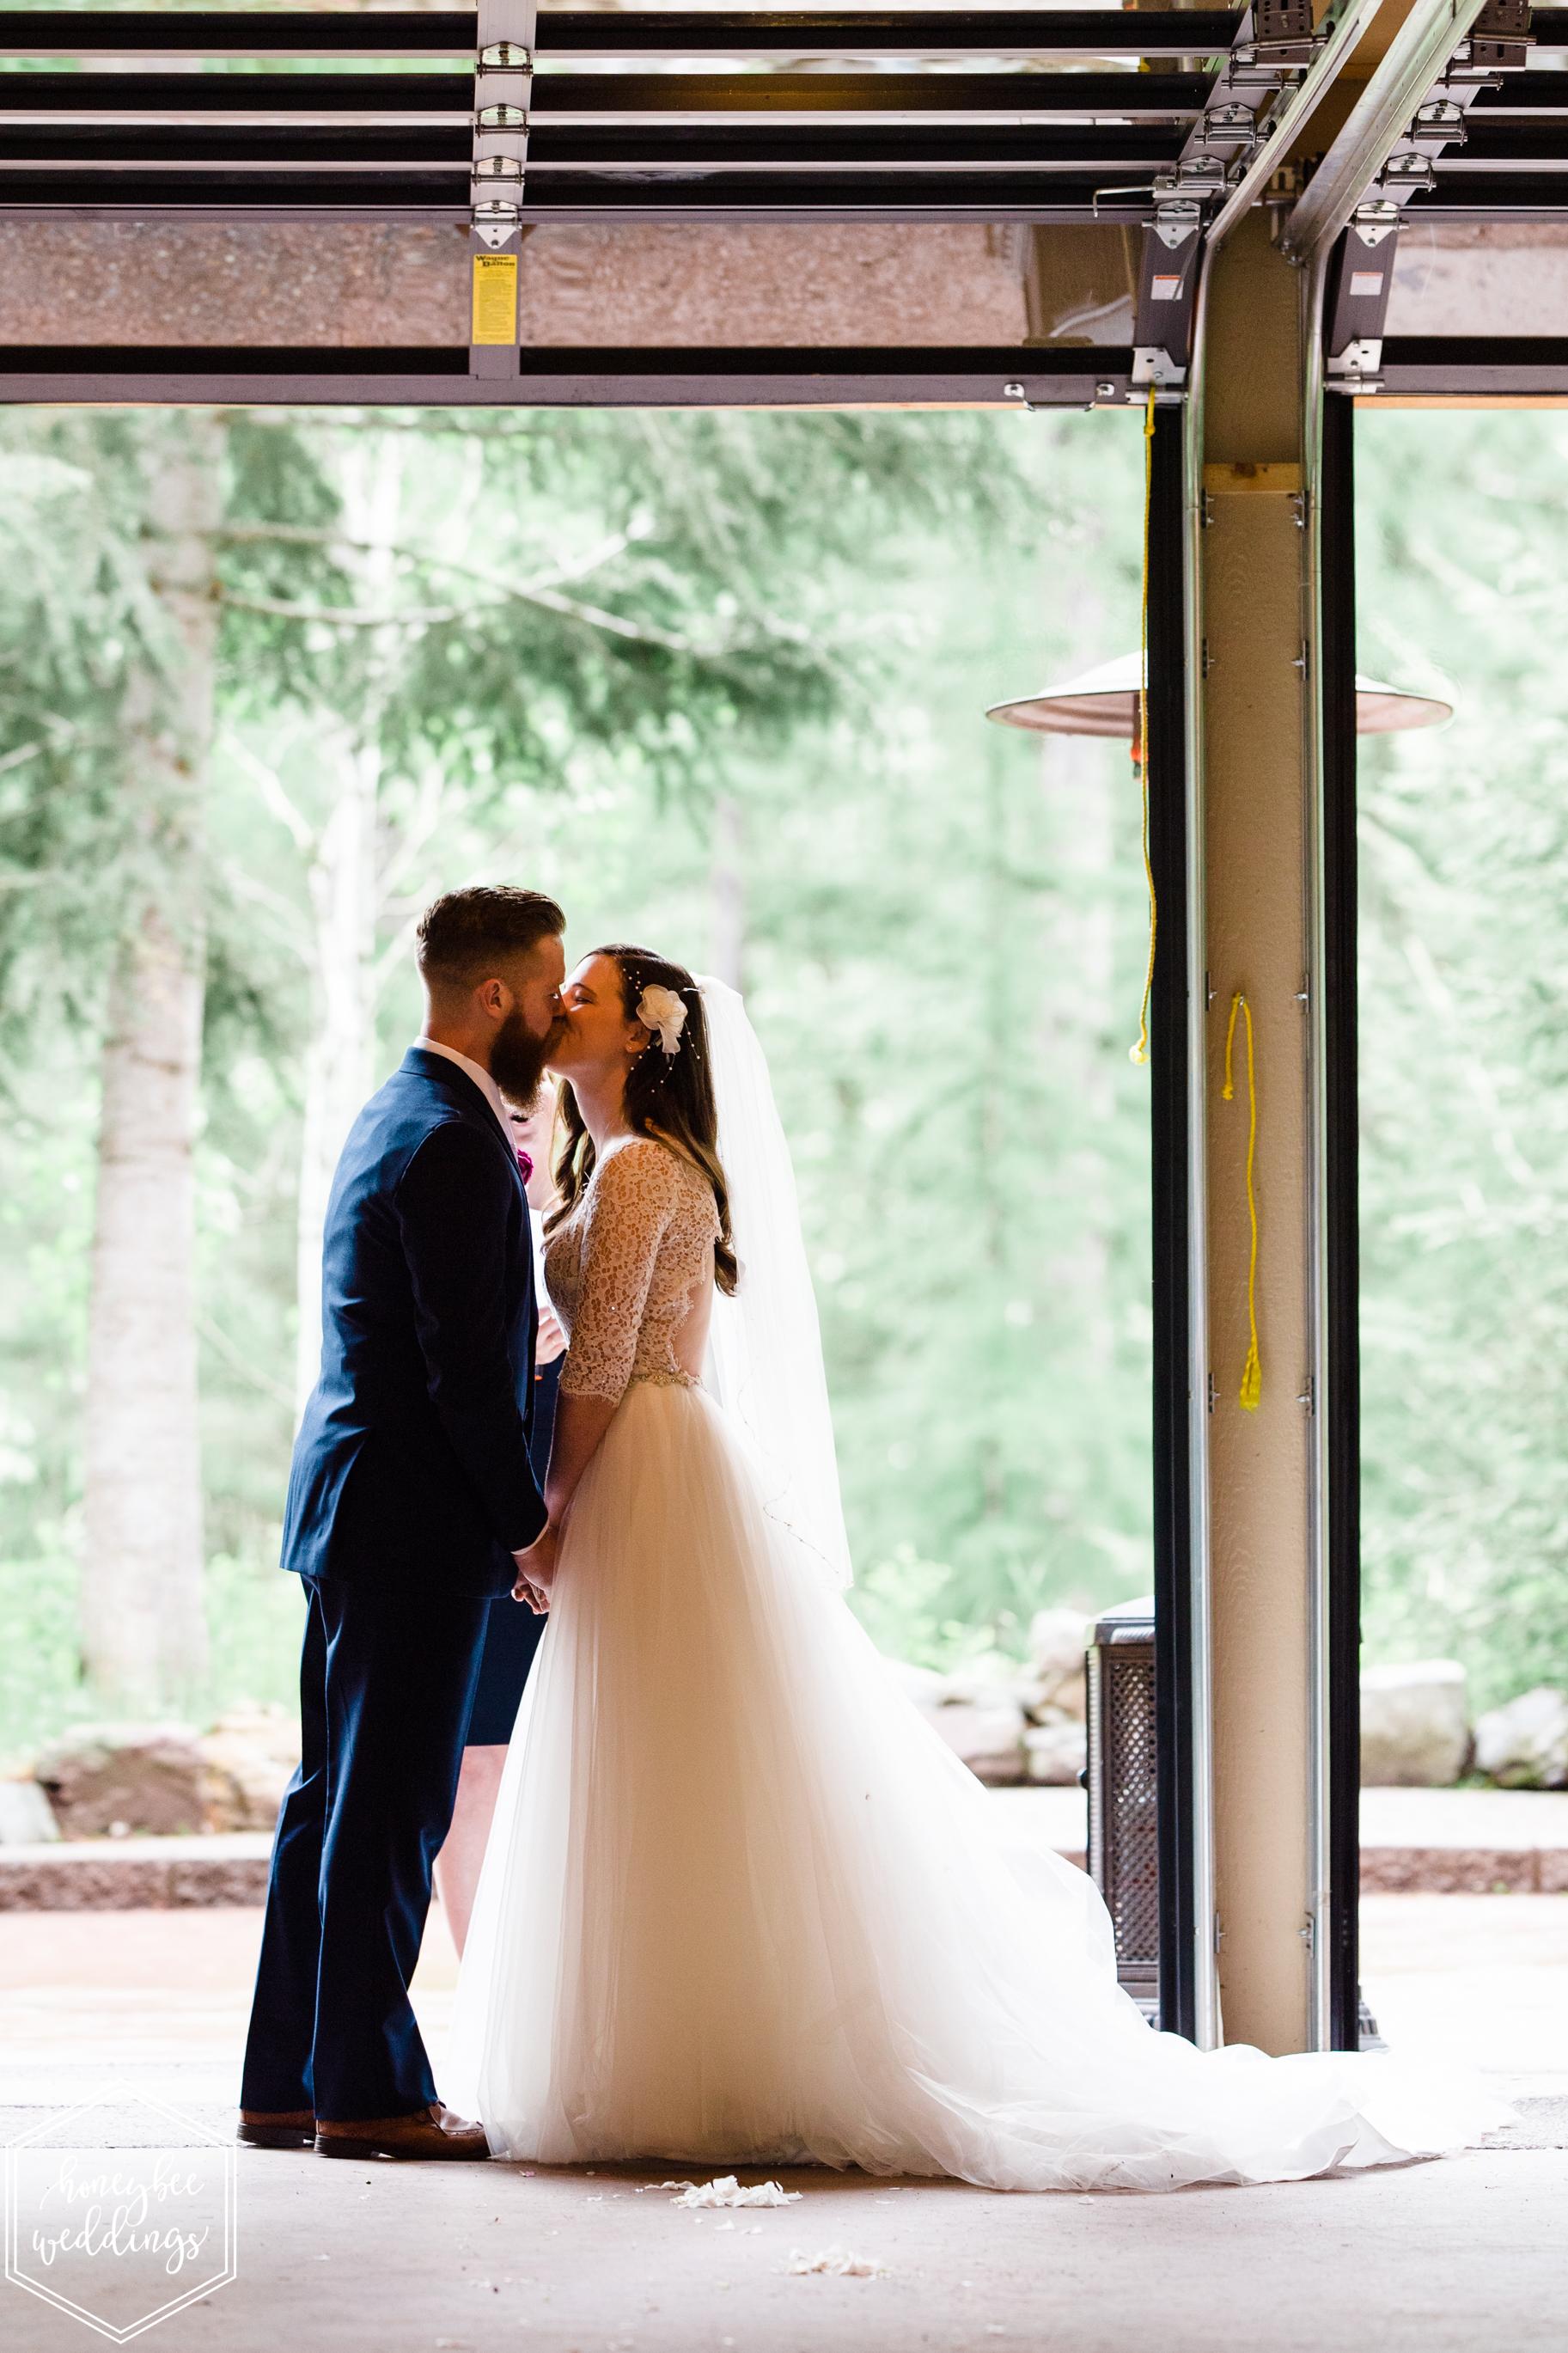 062Glacier National Park Wedding_Izaak Walton Inn Wedding_Honeybee Weddings_Norah & Kyle_June 08, 2019-2195.jpg